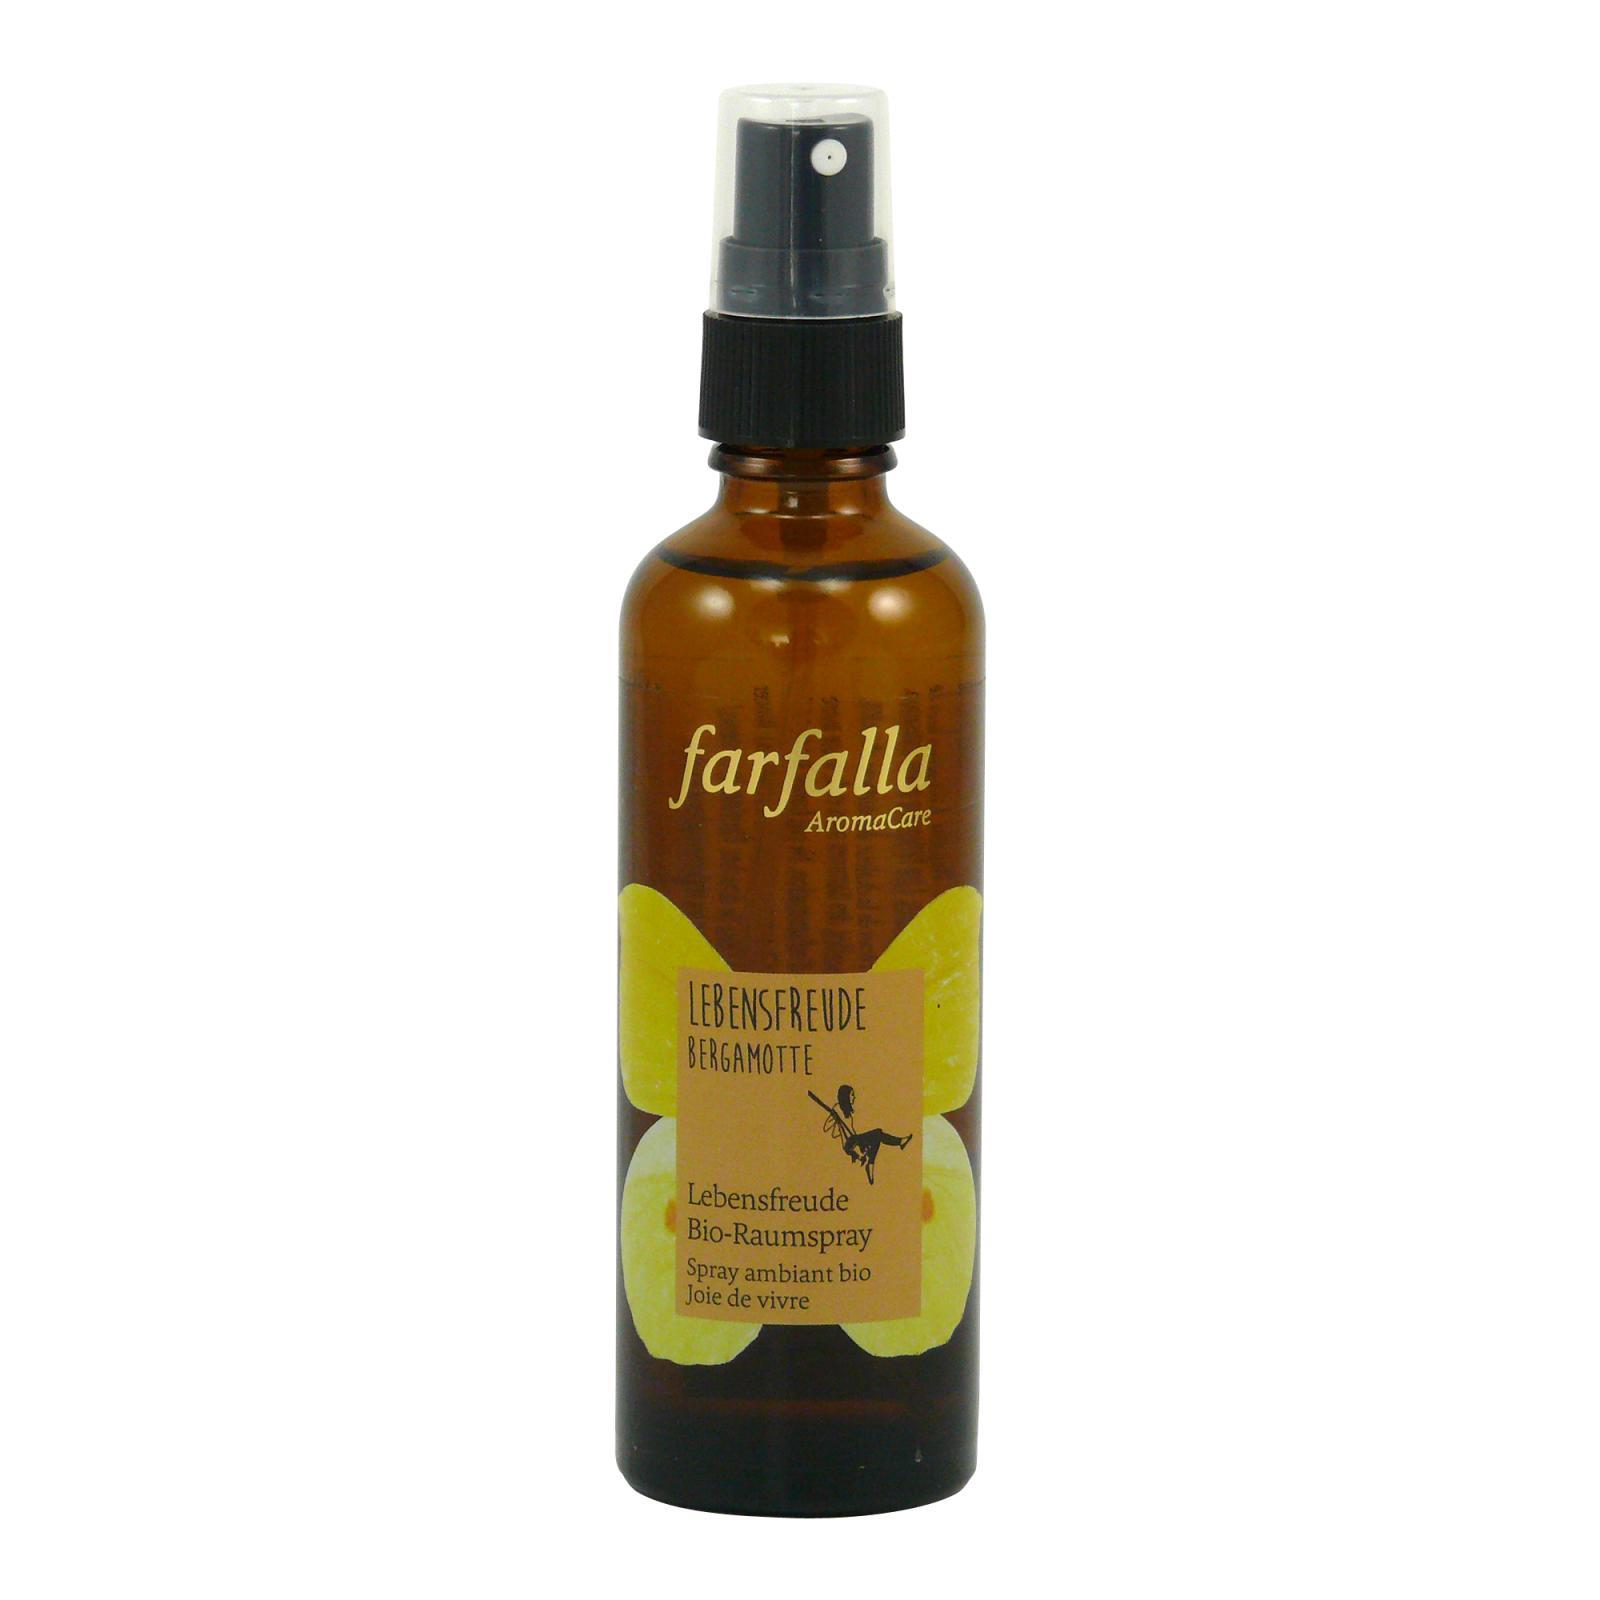 Farfalla Osvěžovač vzduchu Radost ze života, bergamot 75 ml